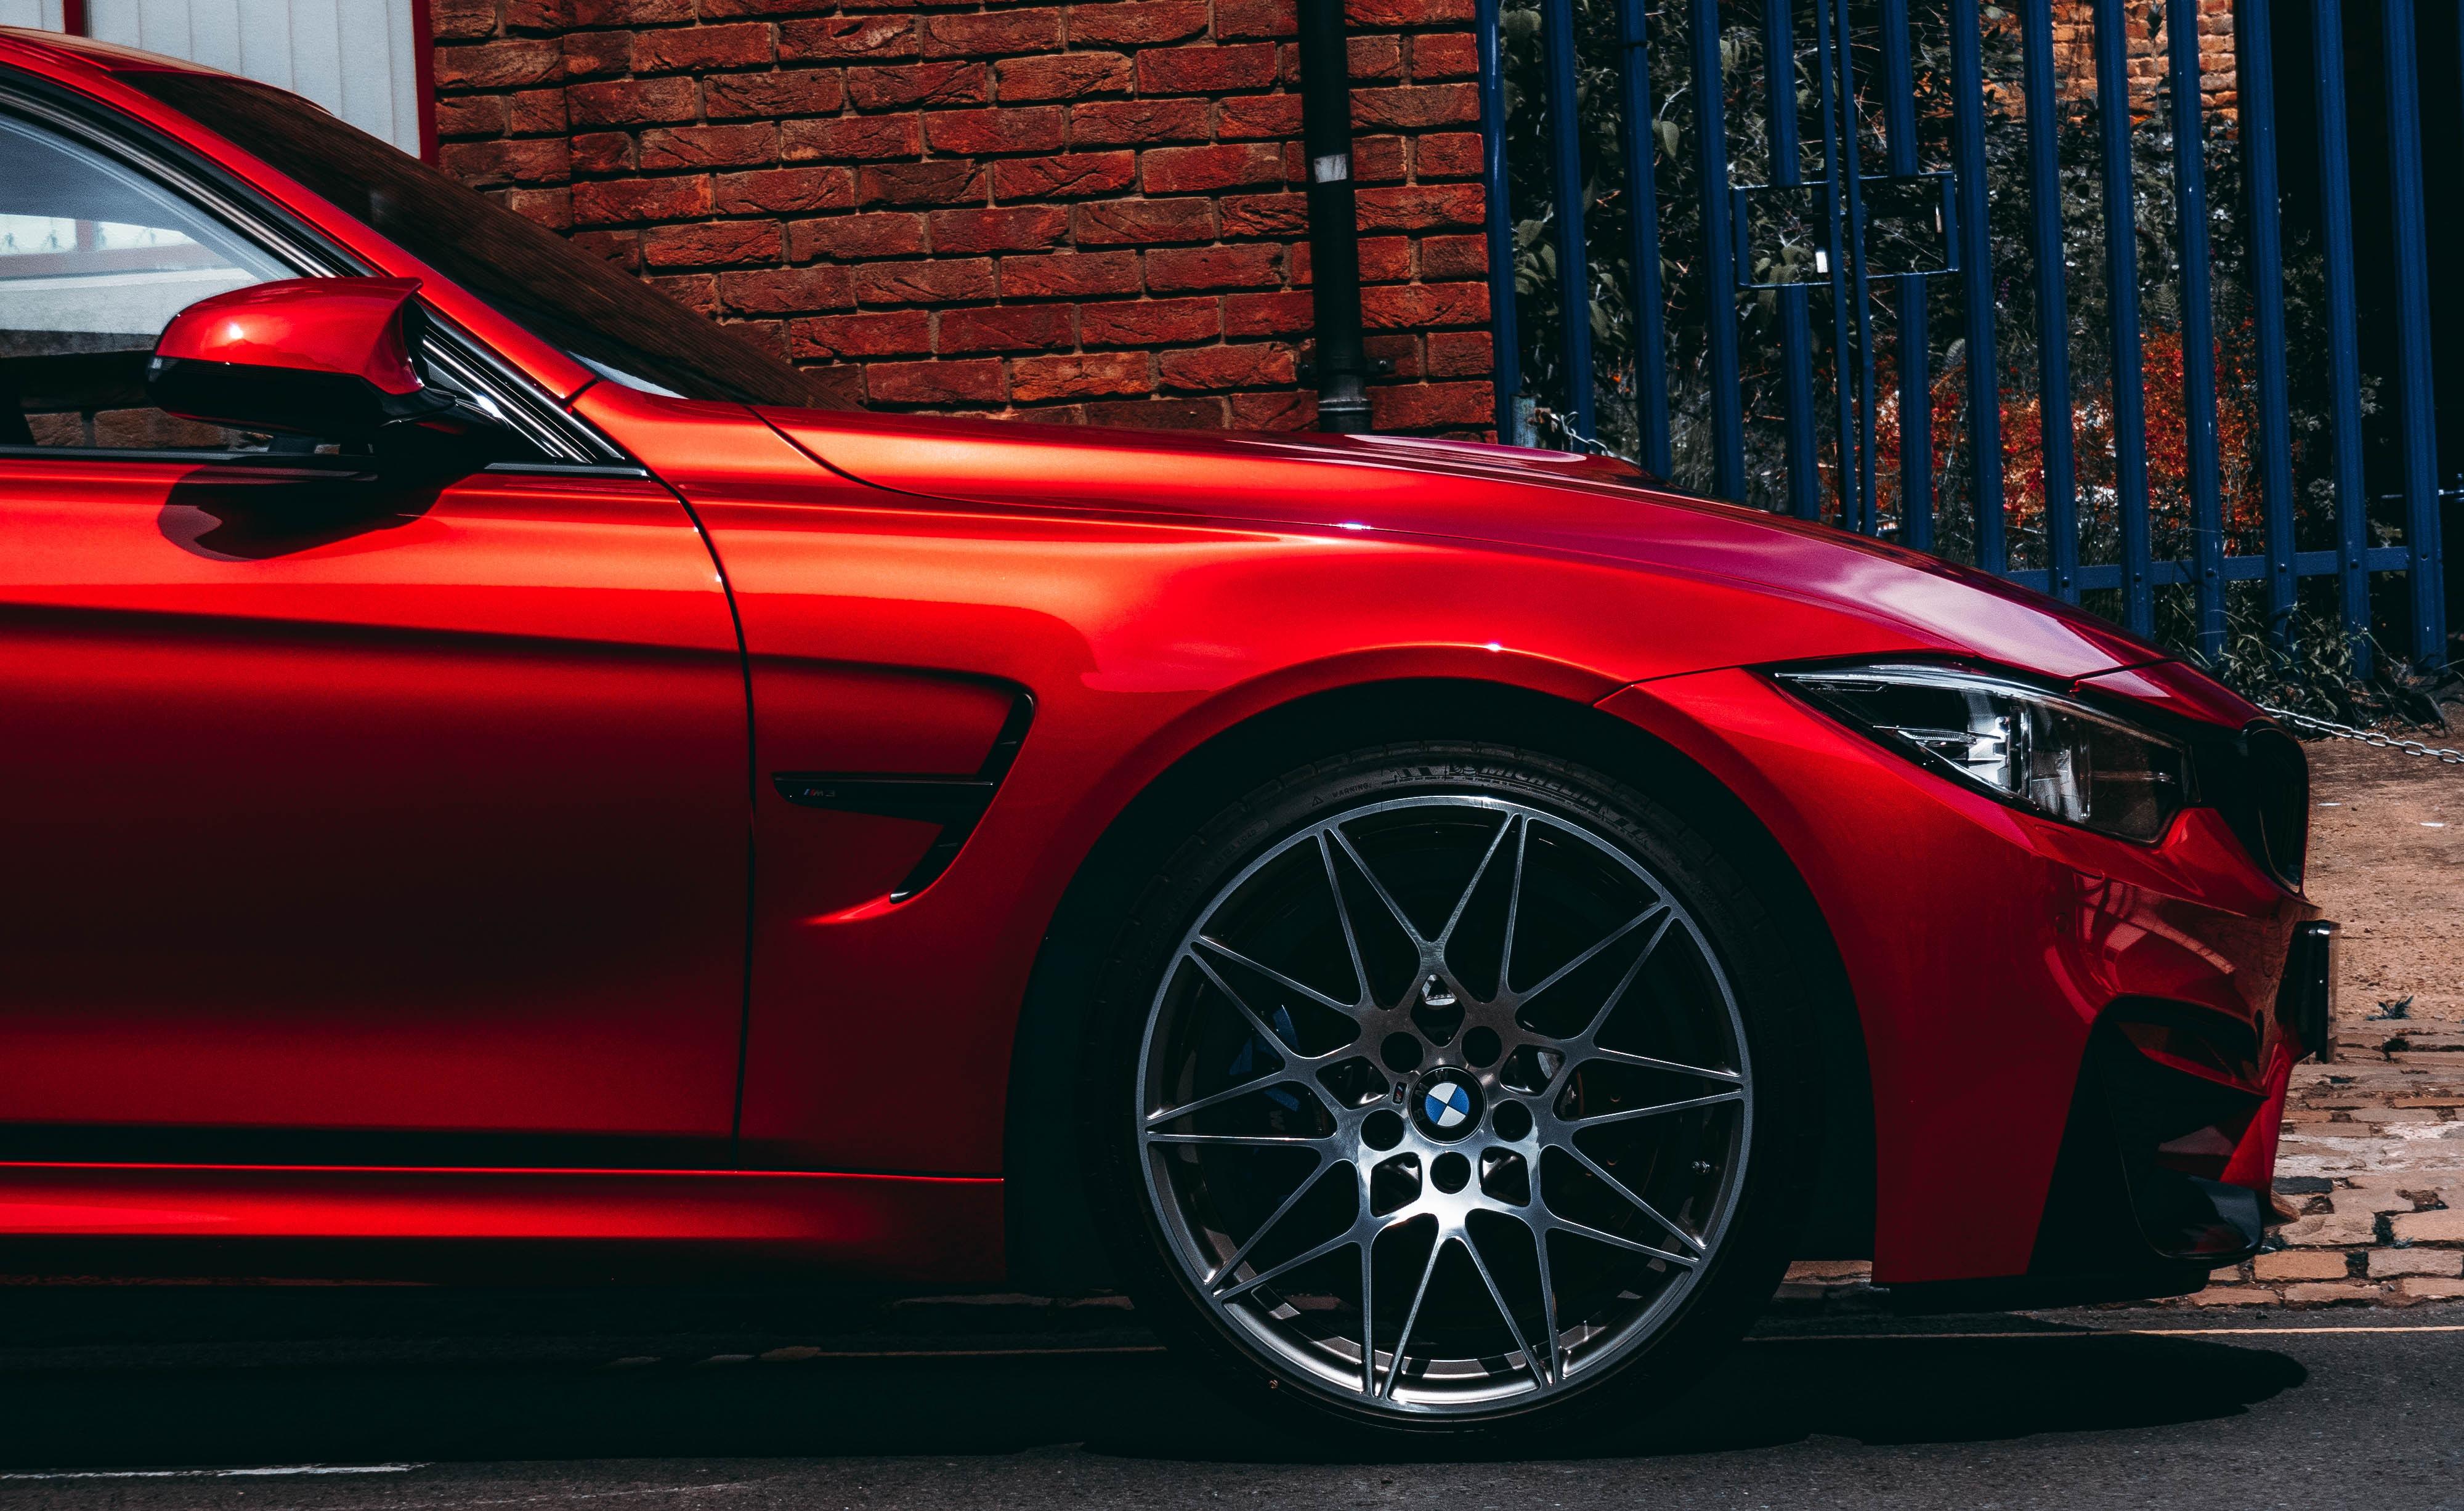 Car repossession laws